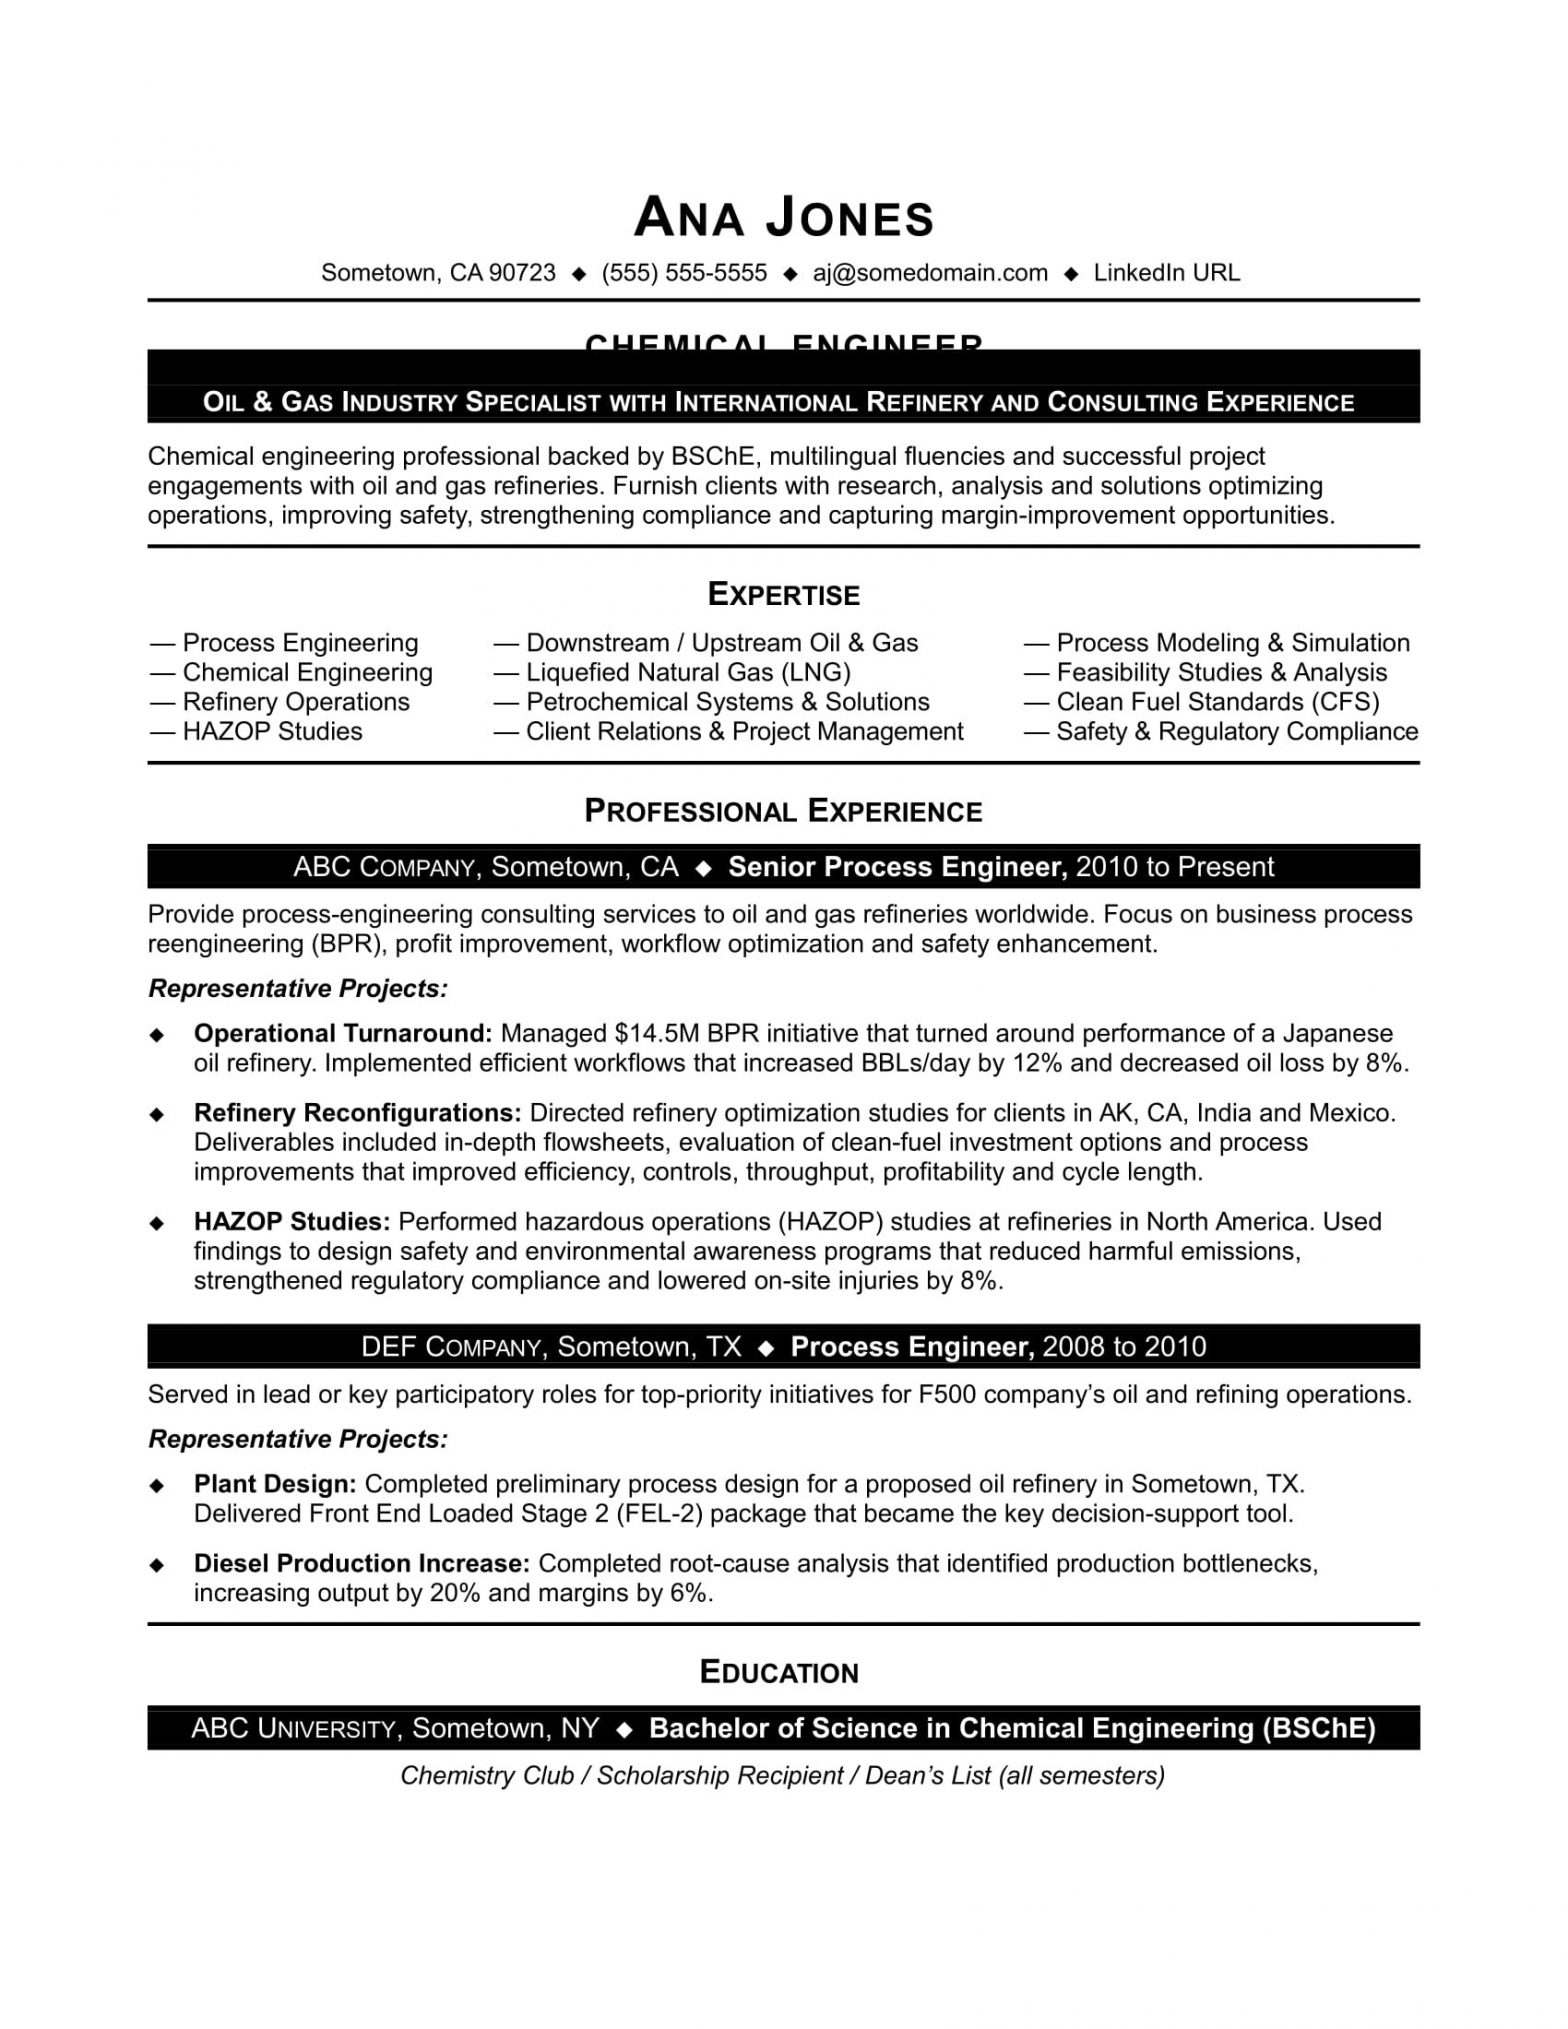 Entry Level Chemical Engineering Resume Sample Sample Resume for Entry Level Chemical Engineer Monster.com